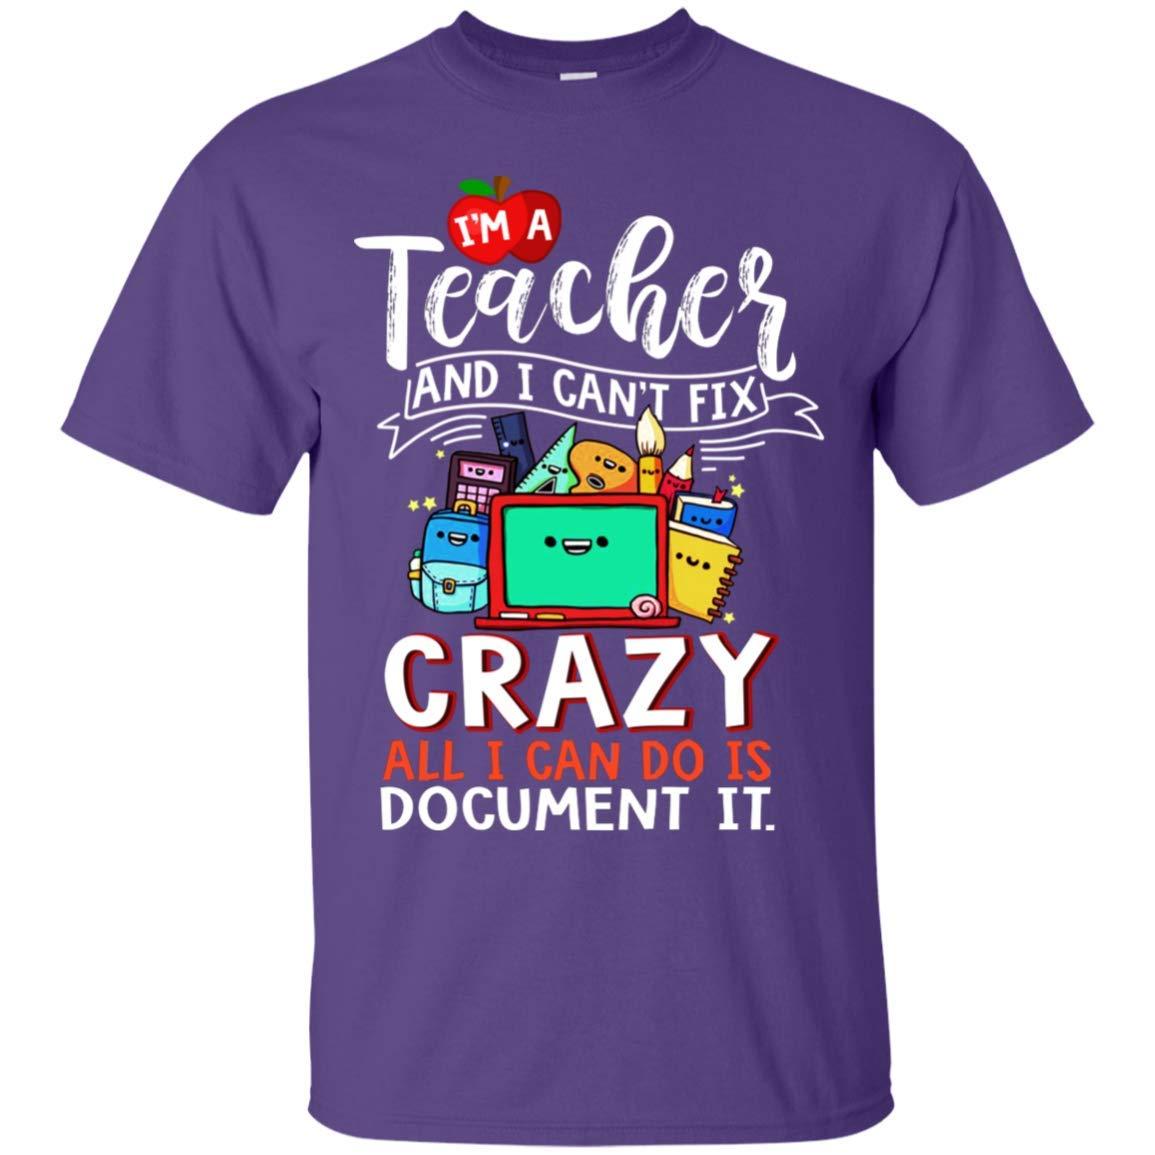 Truekool Im A Tea And I Cant Fix Crazy All I Can Do Is Docut It Funny Gift Tshirt Vneck Shirt